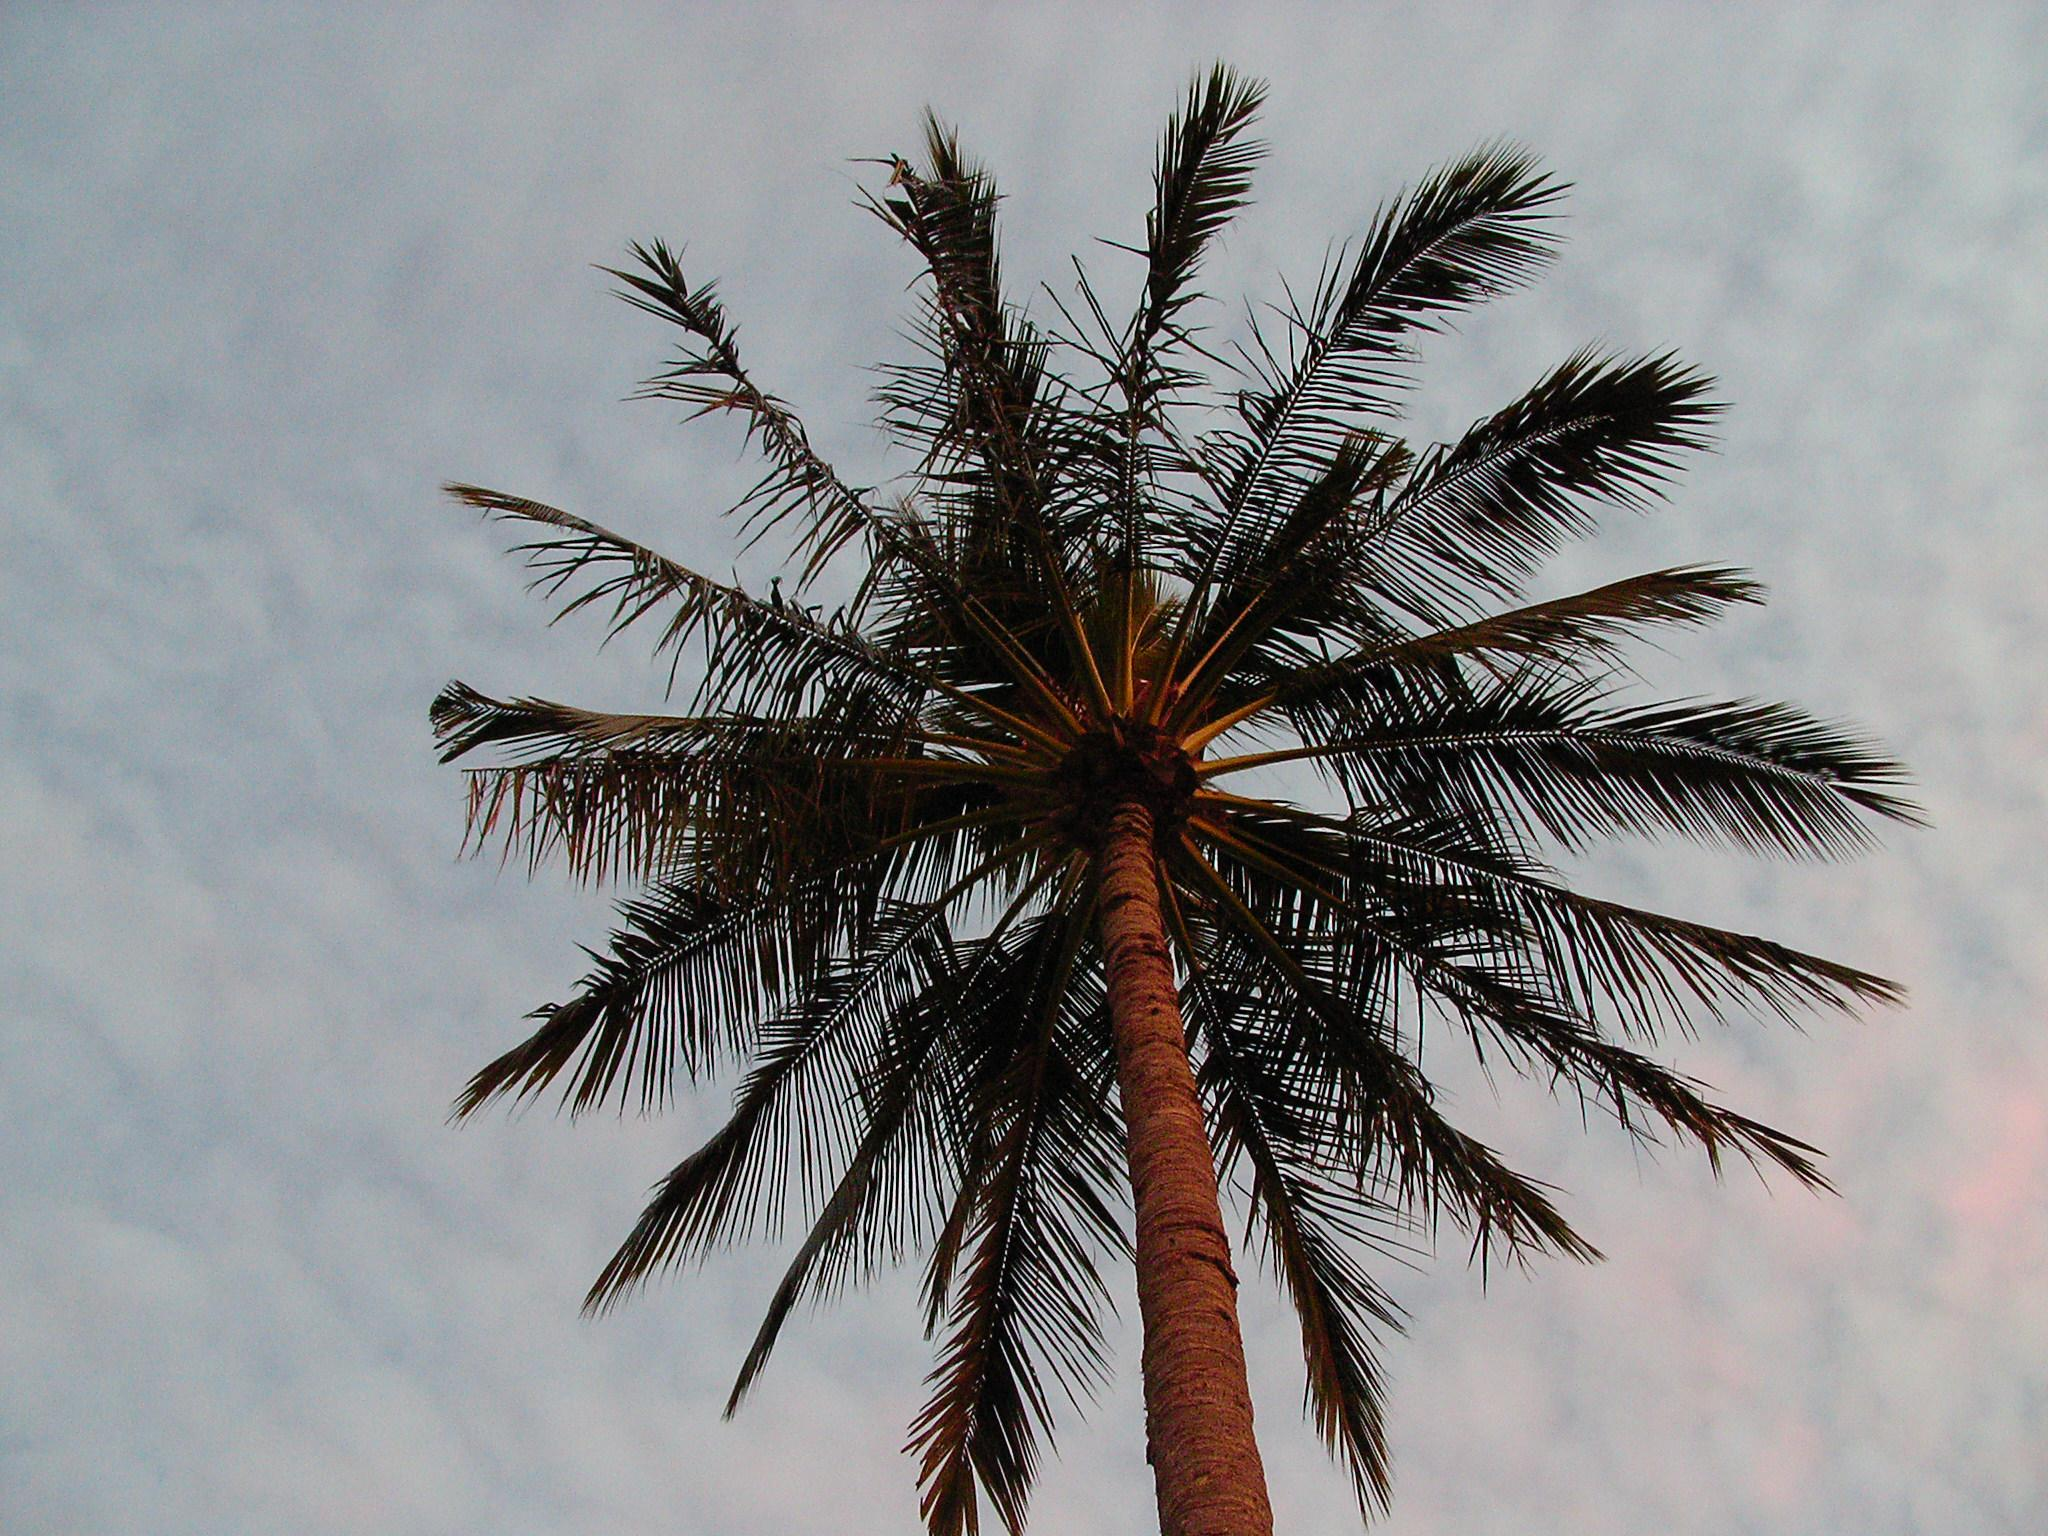 Sky Palm